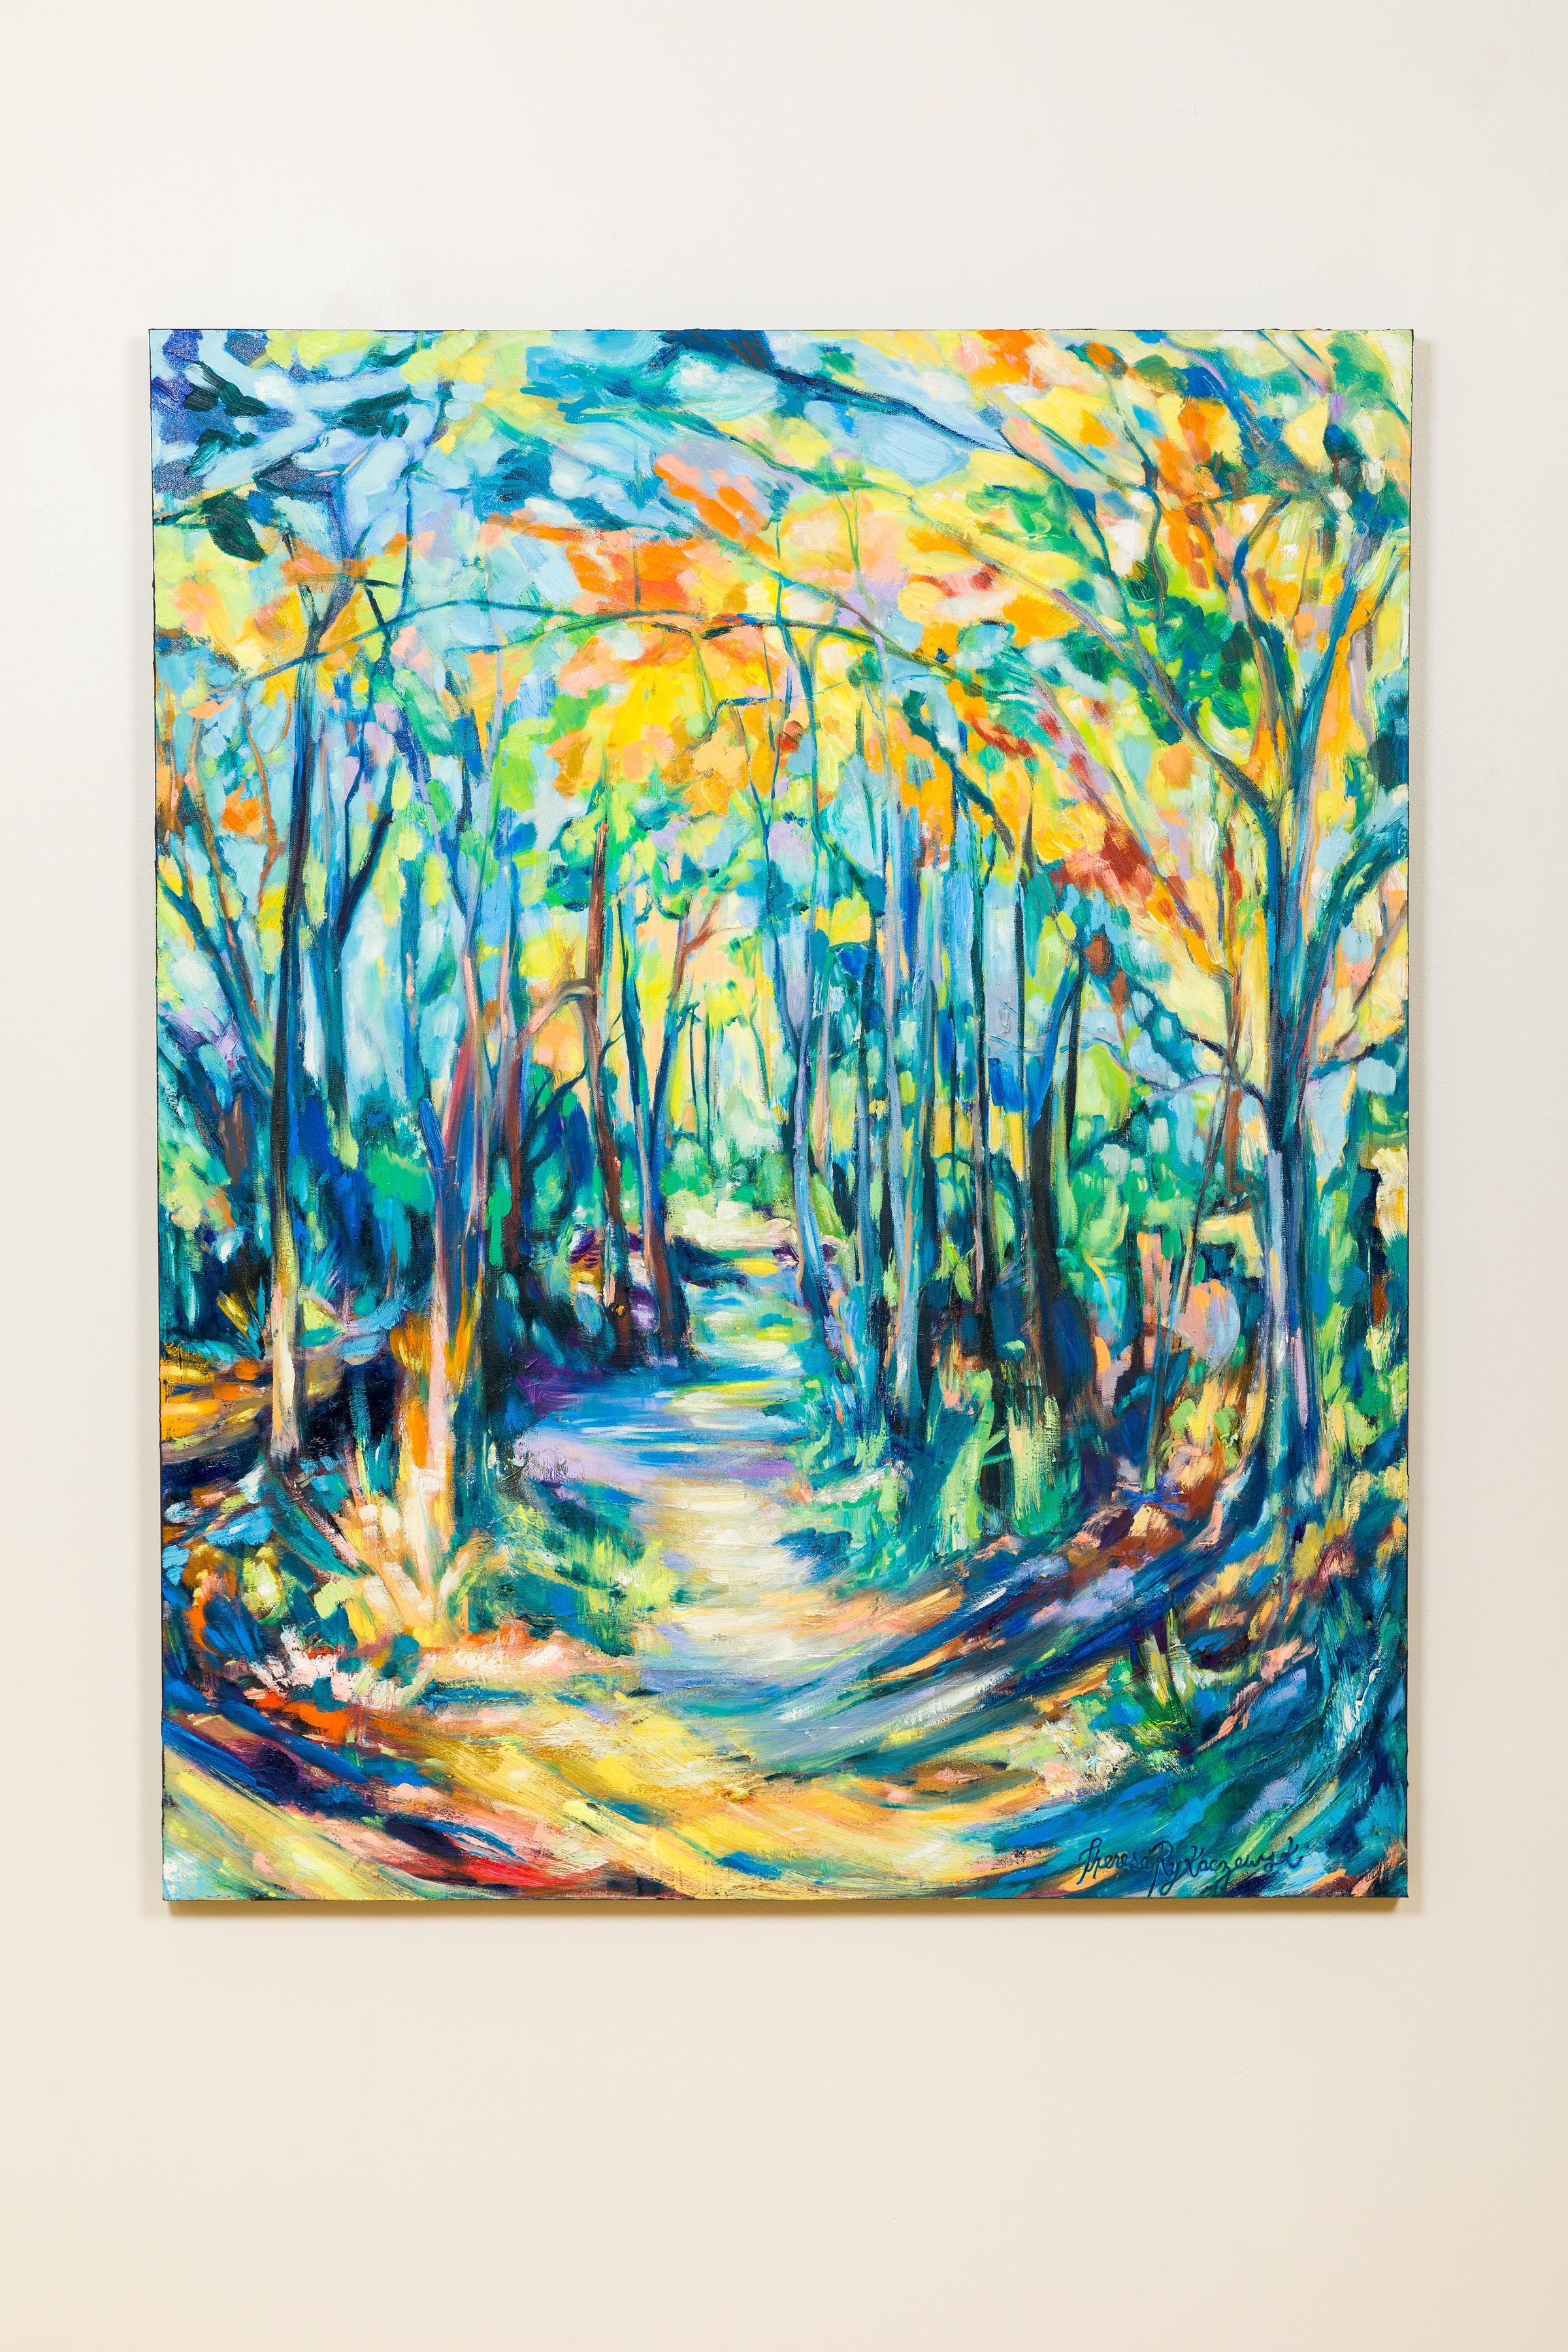 Illuminated Canopy - Theresa Rykaczewski